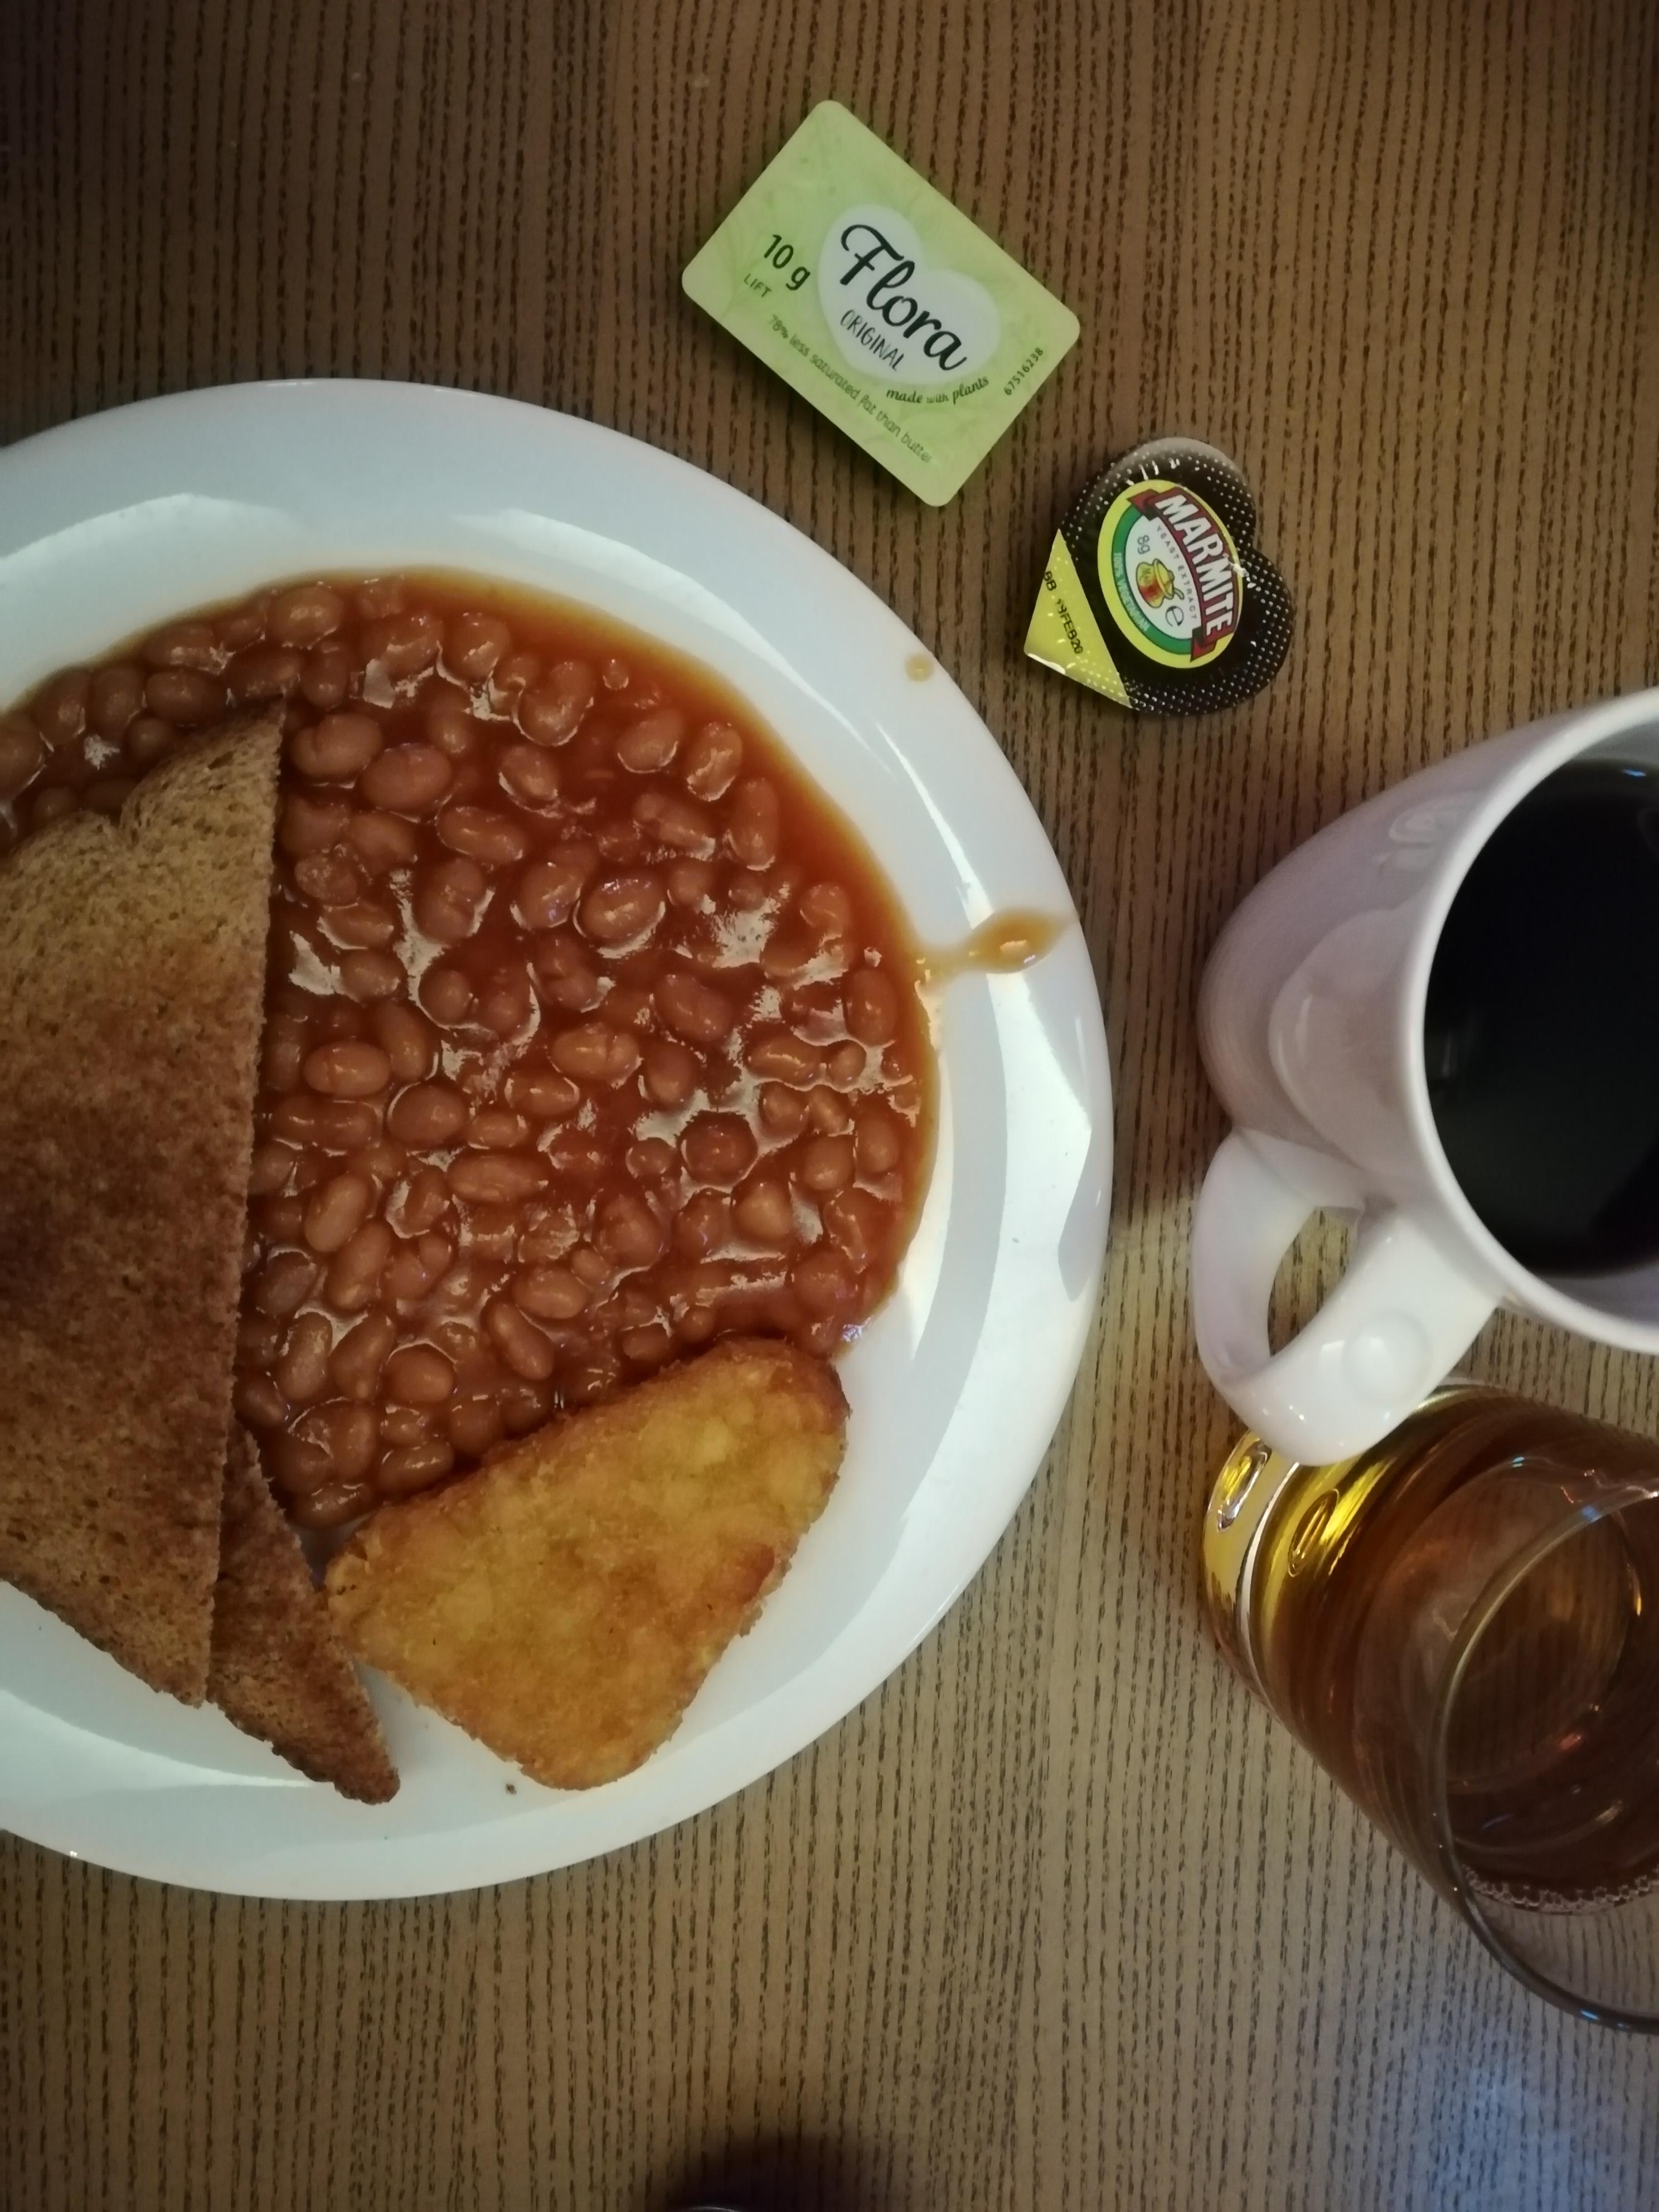 American coffee, apple juice, Marmite❤️, beans, bread, potatoes